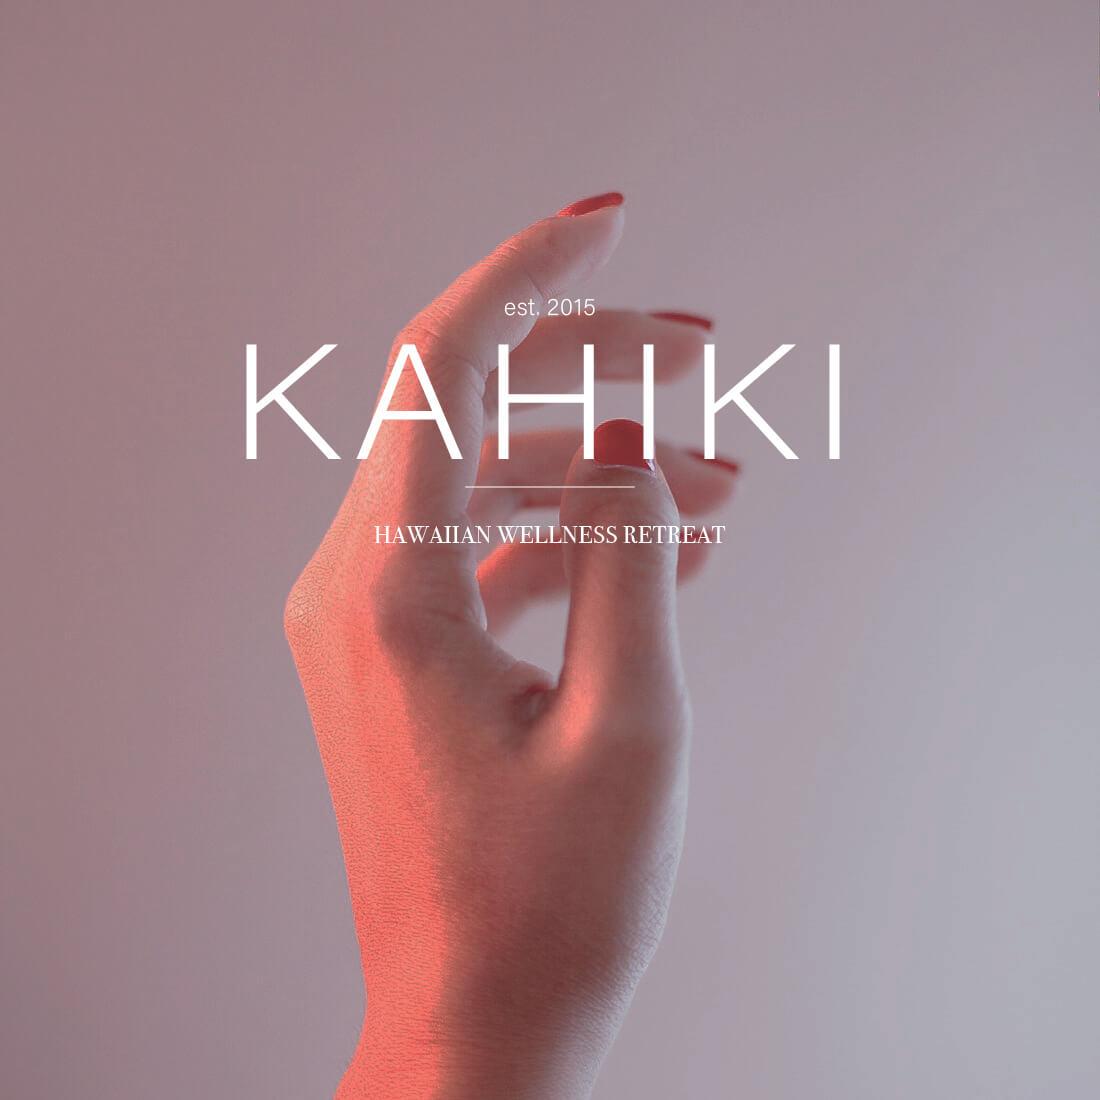 Kahiki Wellness Retreat // by Phylleli #design #branding #logodesign #designblog #typography #wellness